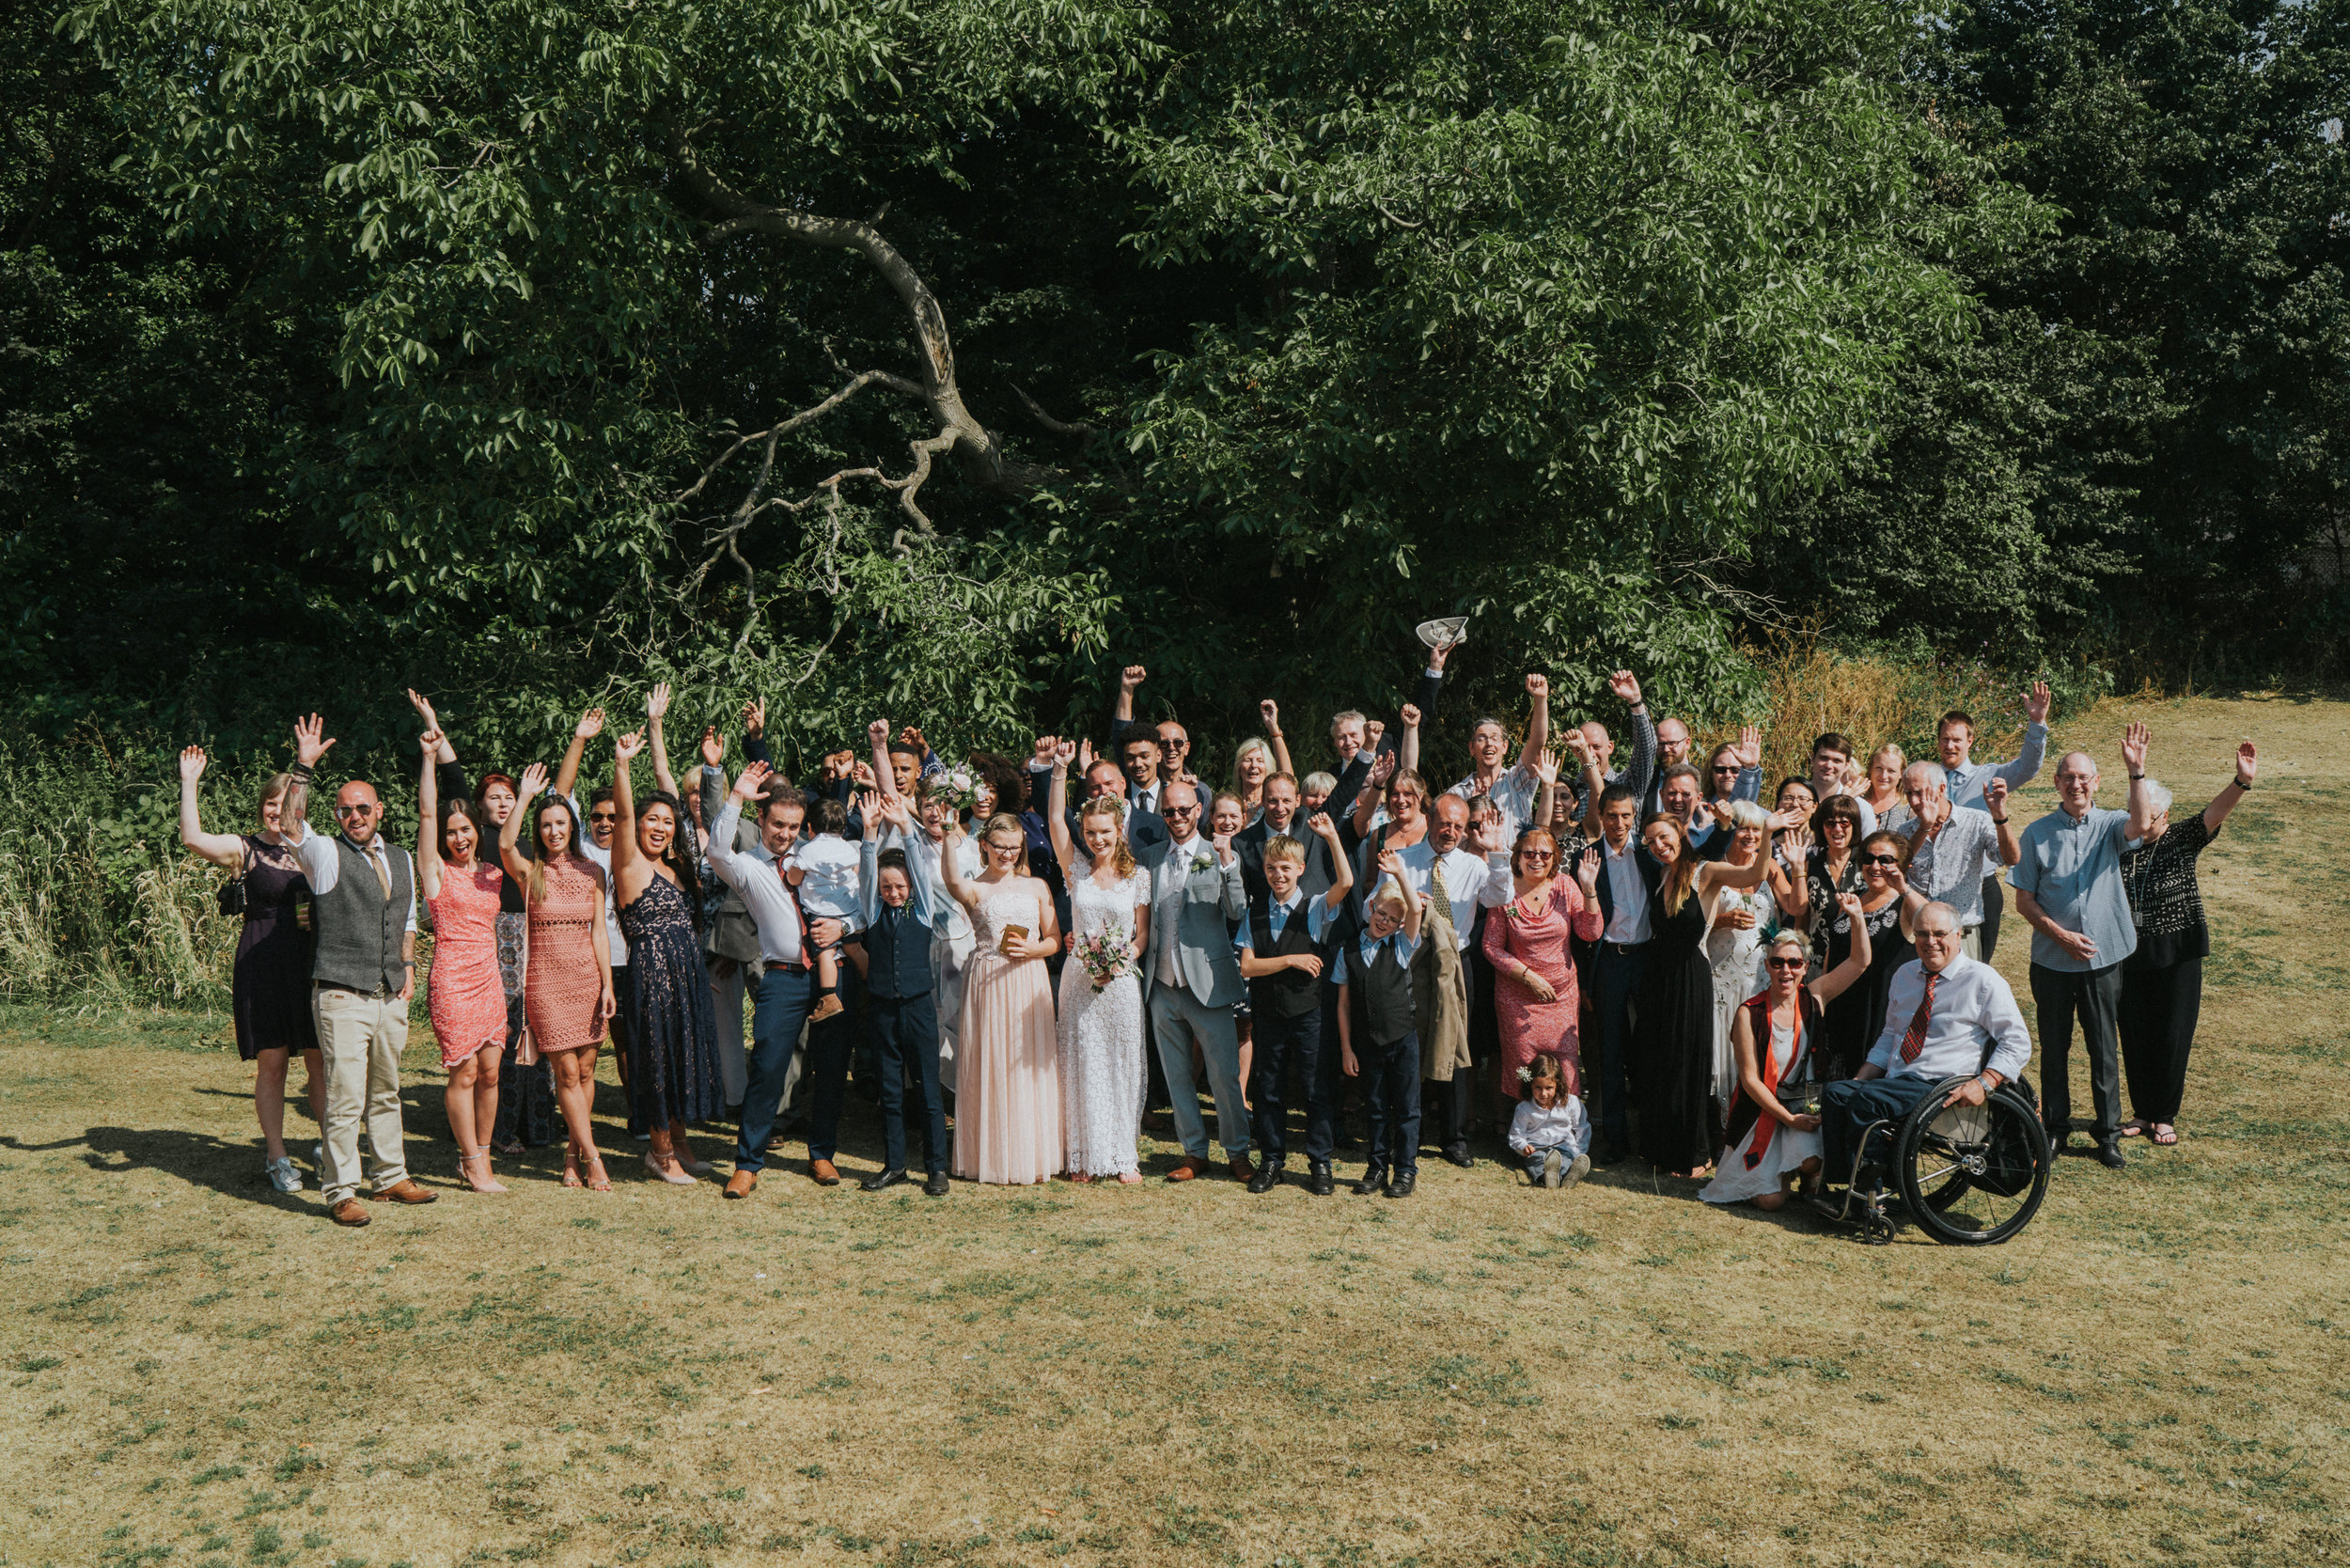 Grace-Elizabeth-Georgie-Amalaketu-Firstsite-Colchester-Essex-Boho-Buddhist-Wedding-Alternative-Wedding-Photography-Essex (73 of 100).jpg